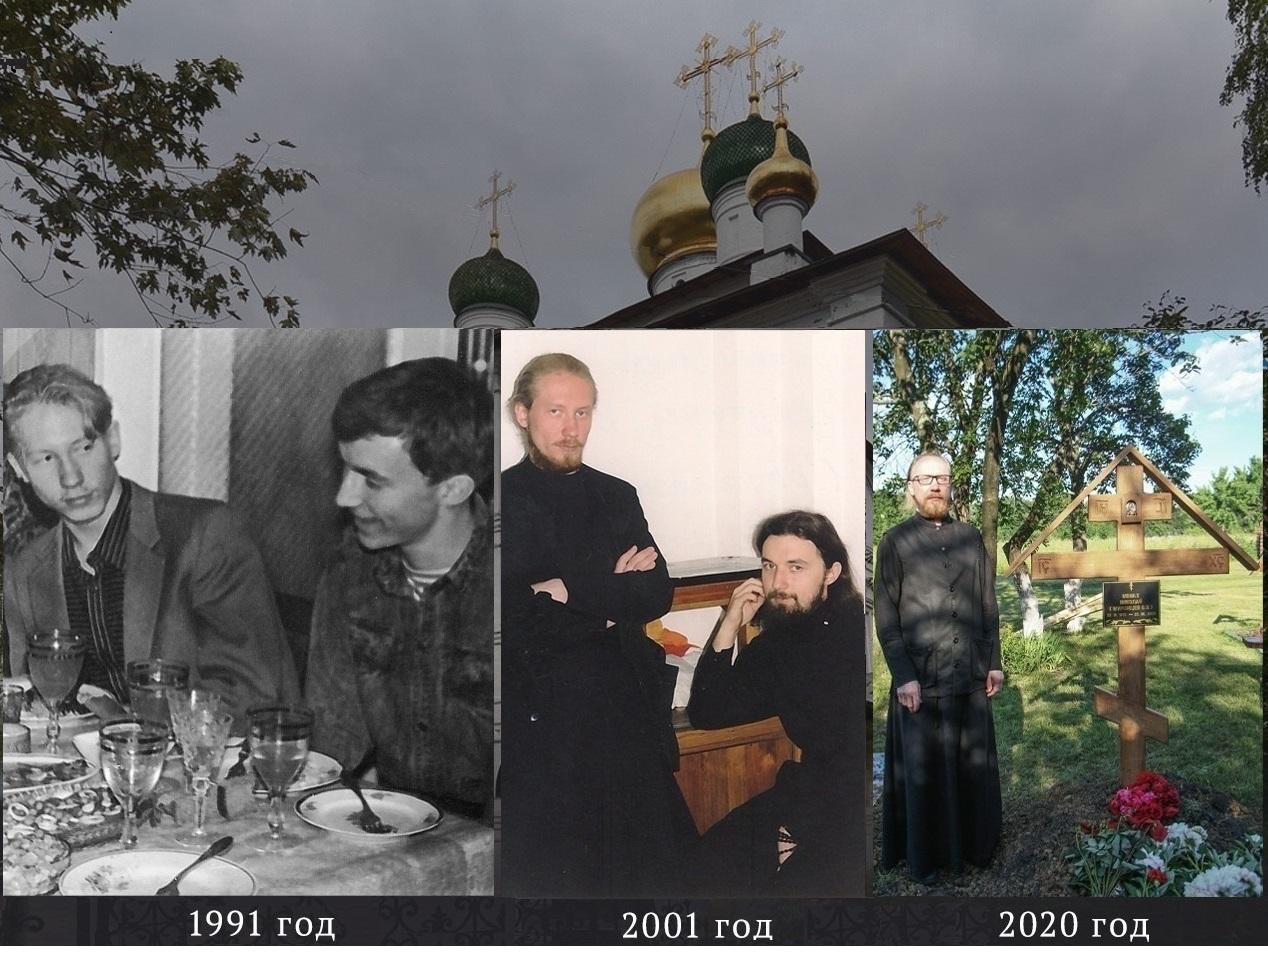 Памяти друга и брата во Христе - монаха Николая (Валерия Муромцева)